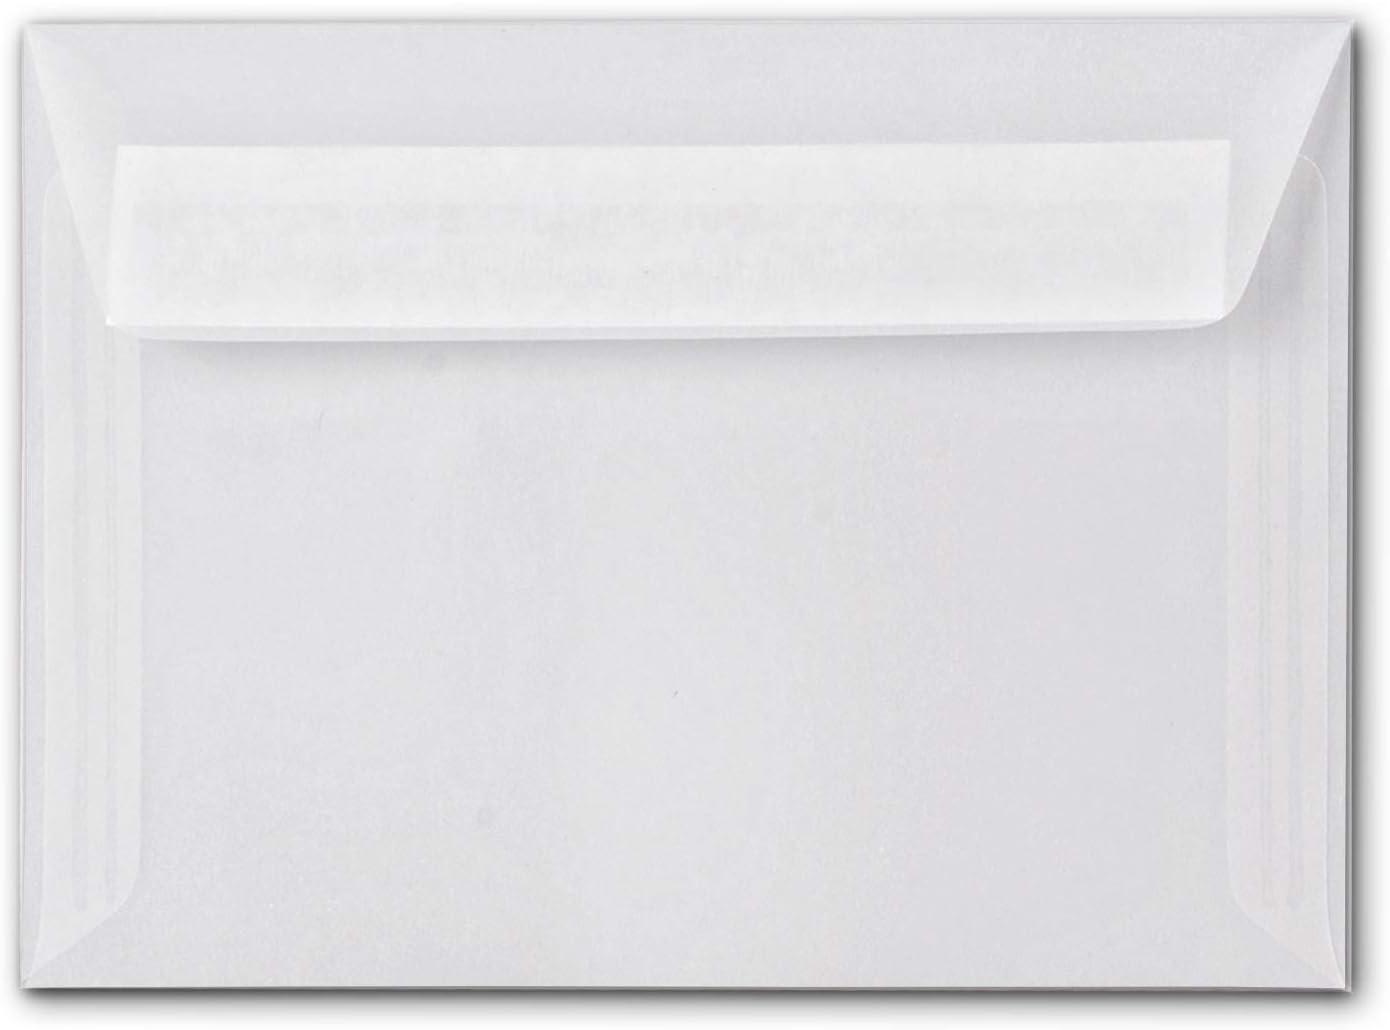 Sharplace Cubierta de Asiento Universal Antideslizante Y Transpirable Moto 828x465 mm Rosa negro